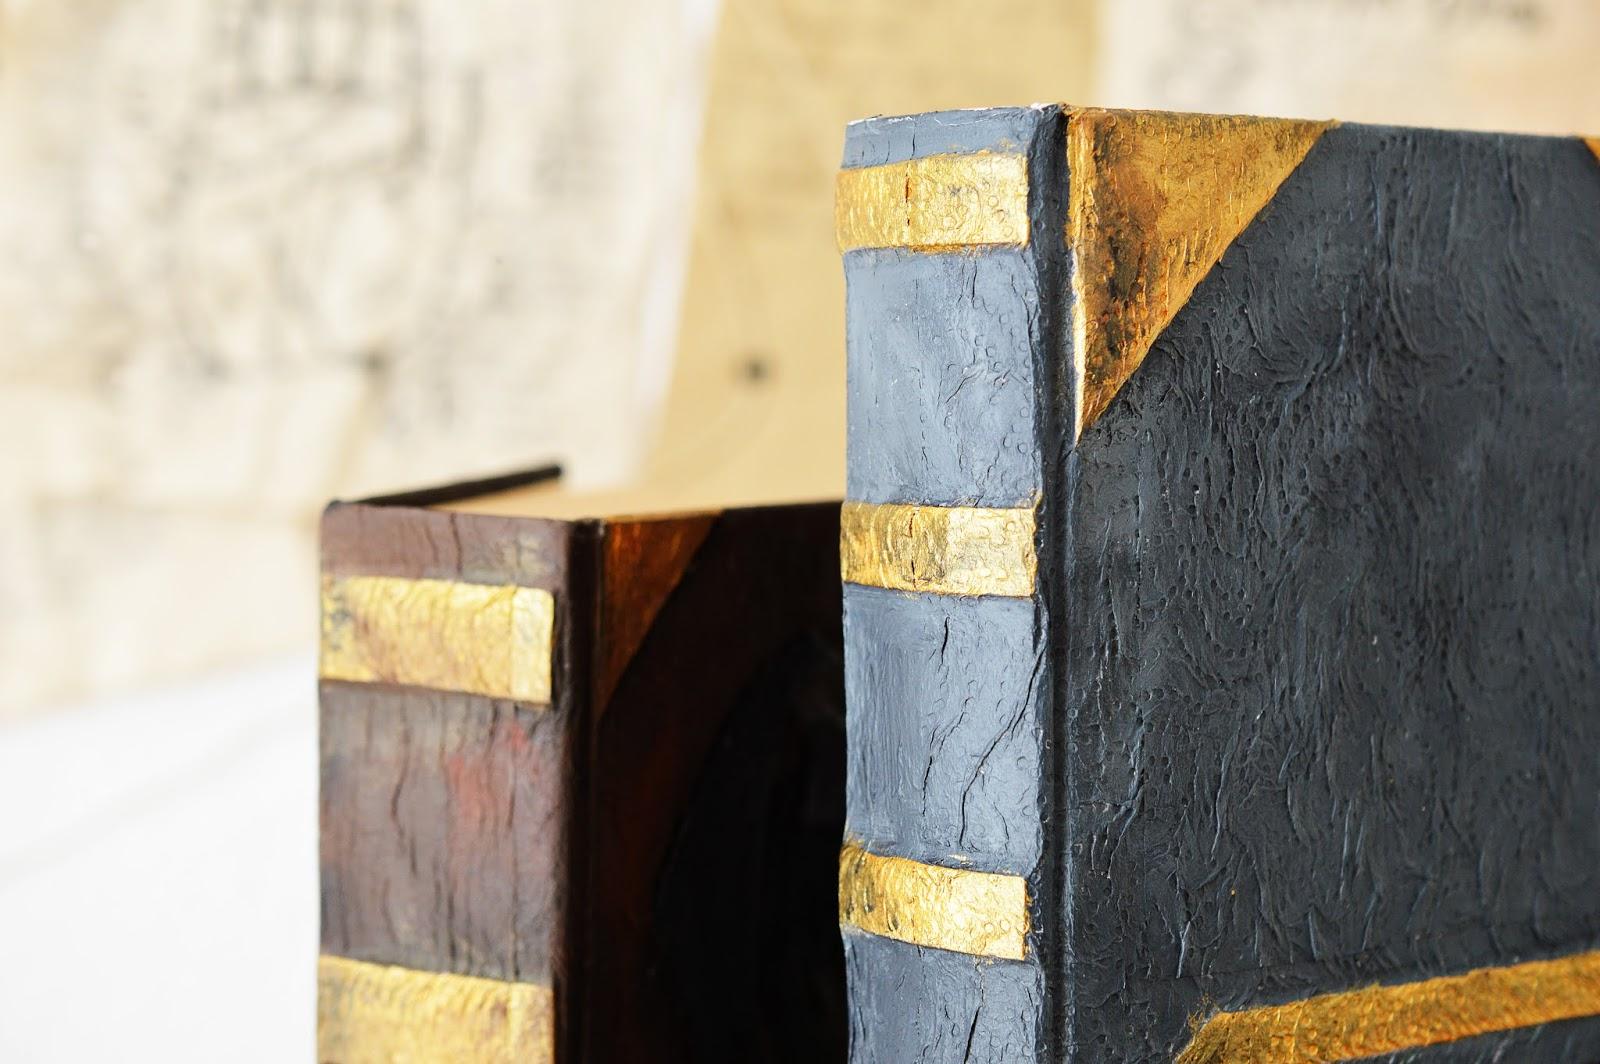 spine of a DIY Papier-Maché Spell Book